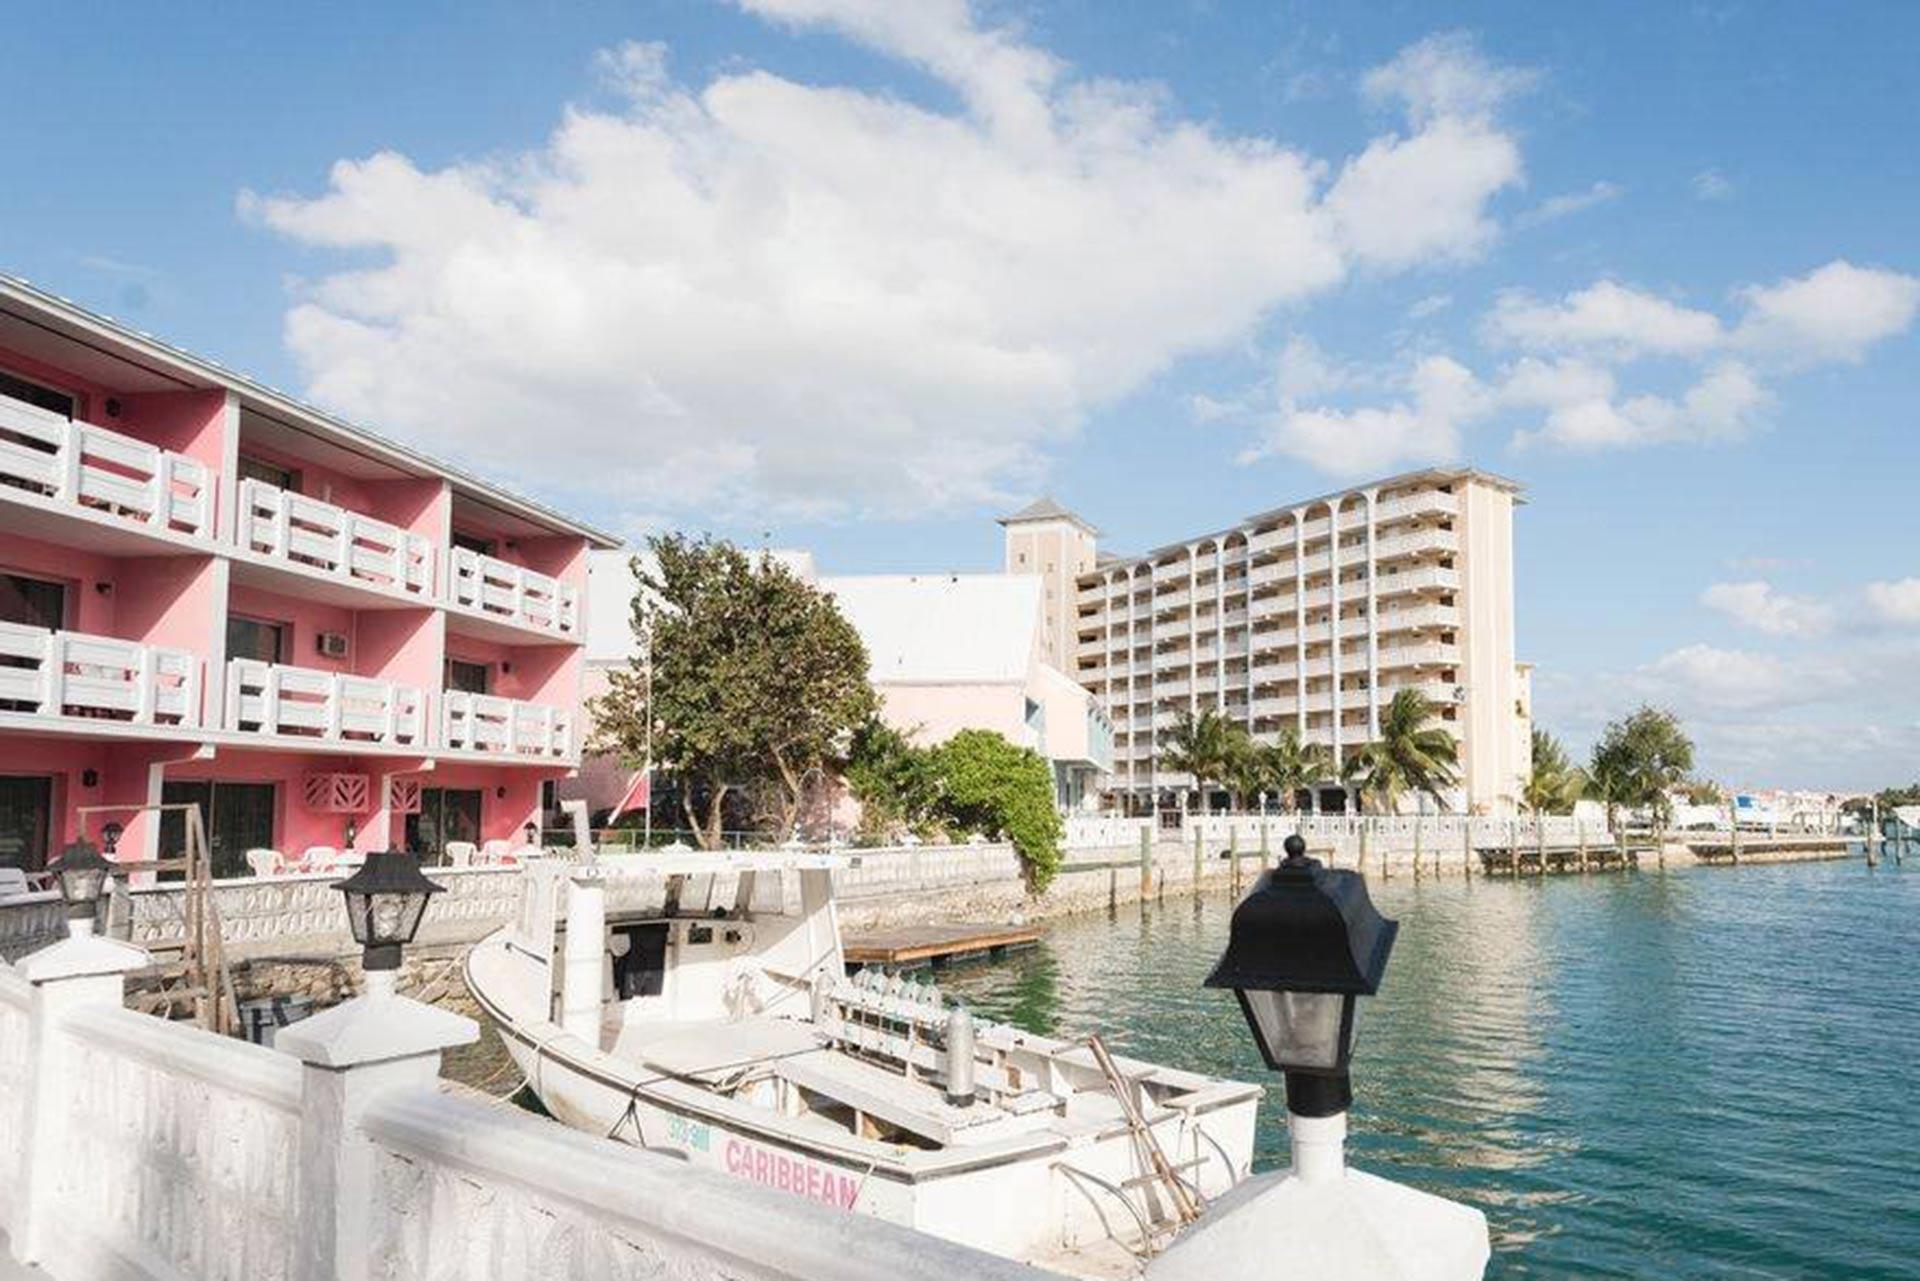 Bell Channel Inn on Grand Bahama Island; Photo Courtesy of Bell Channel Inn